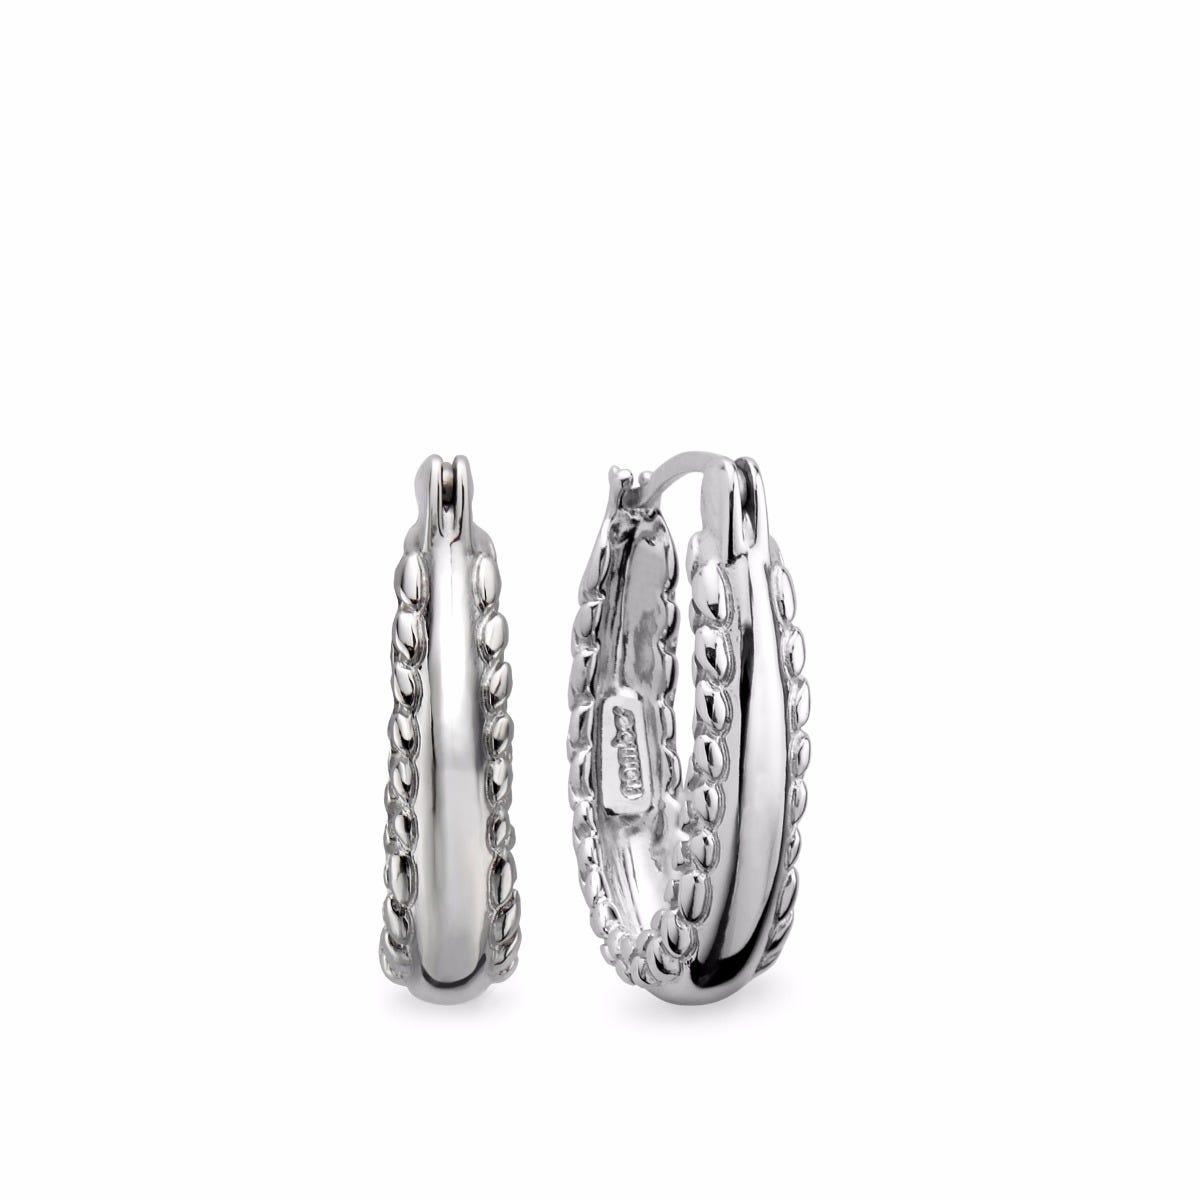 Double-Side Braid Hoop Earrings in Sterling Silver